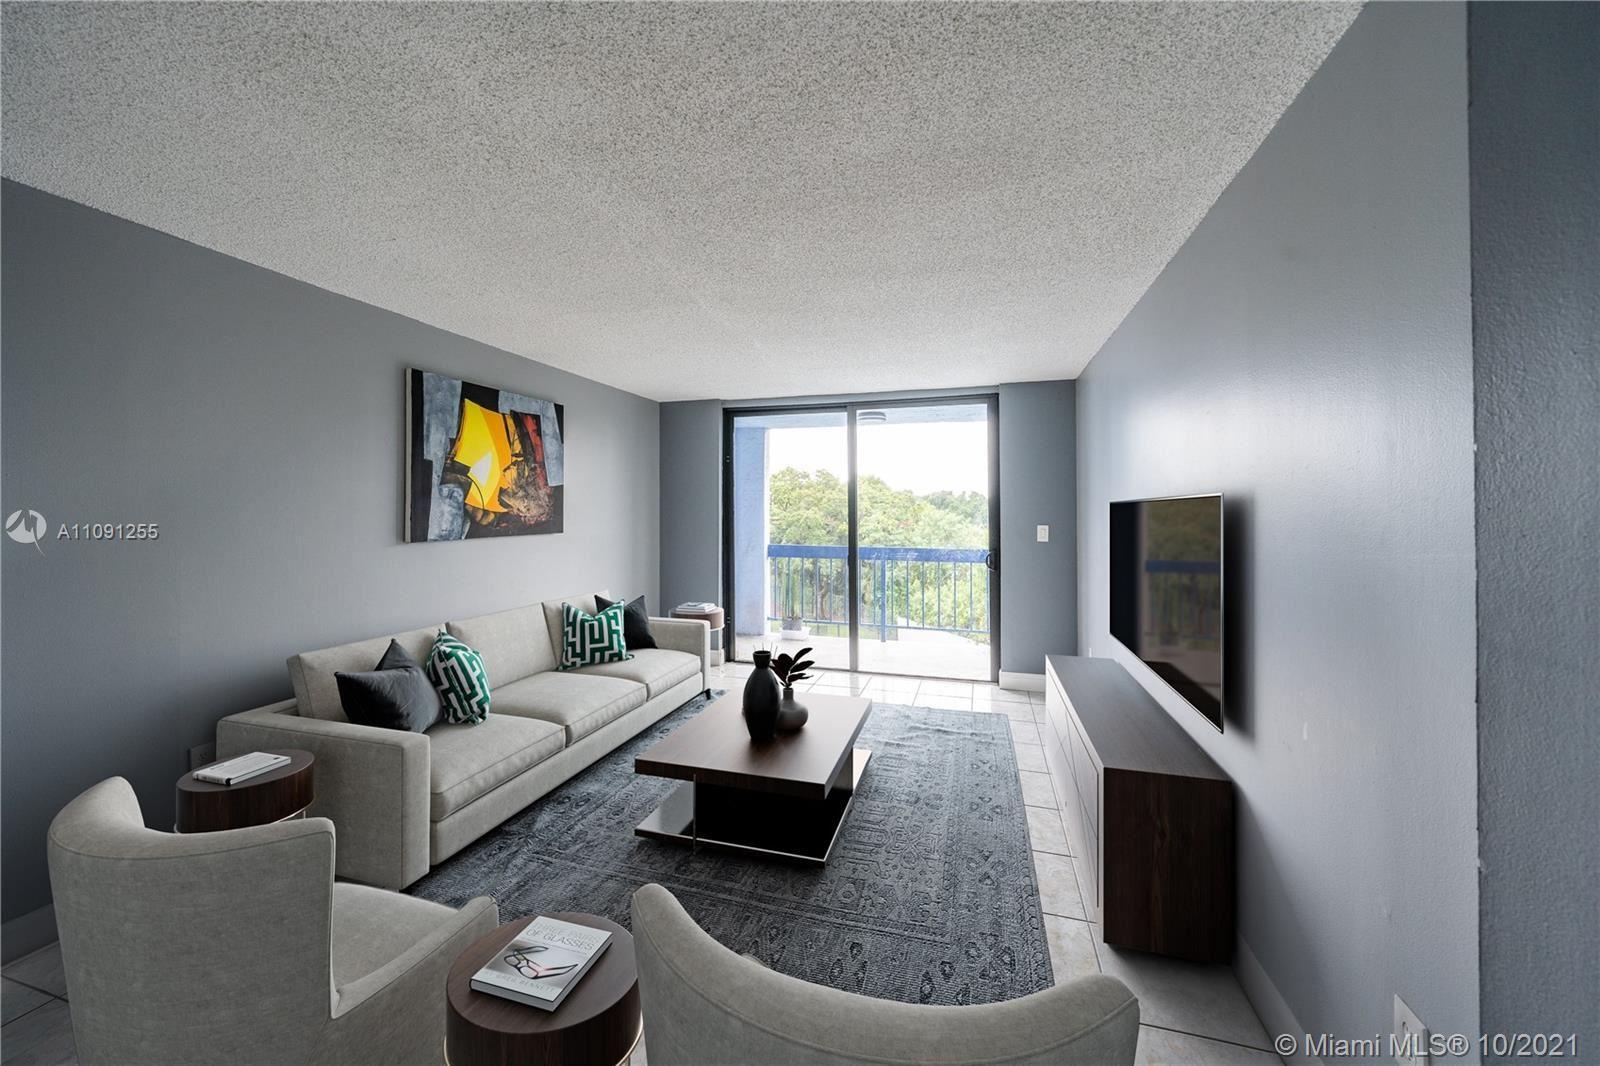 9460 Fontainebleau Blvd #420, Miami, FL 33172 - #: A11091255